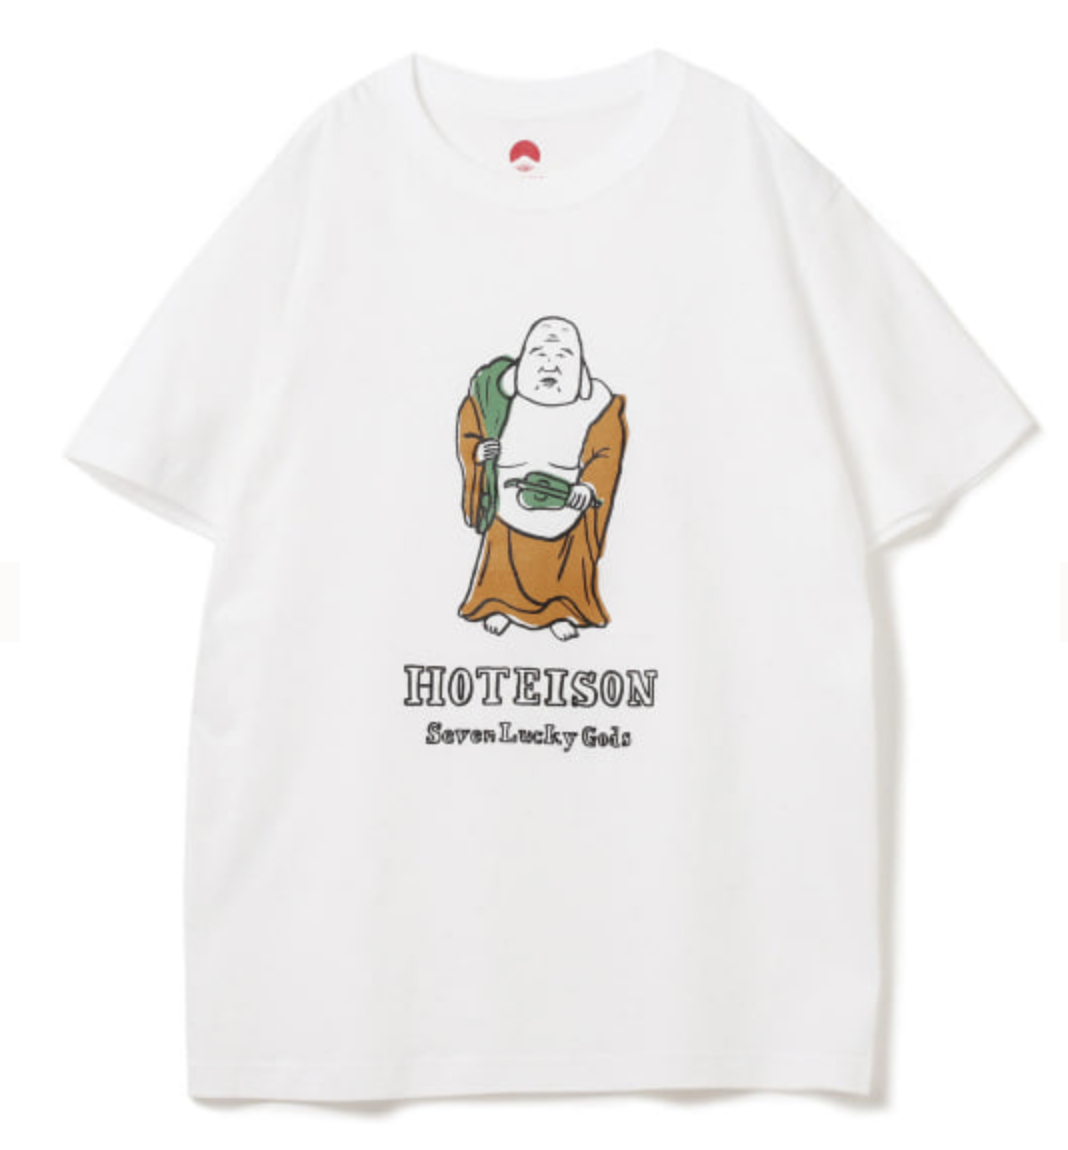 HOTEISONのTシャツ